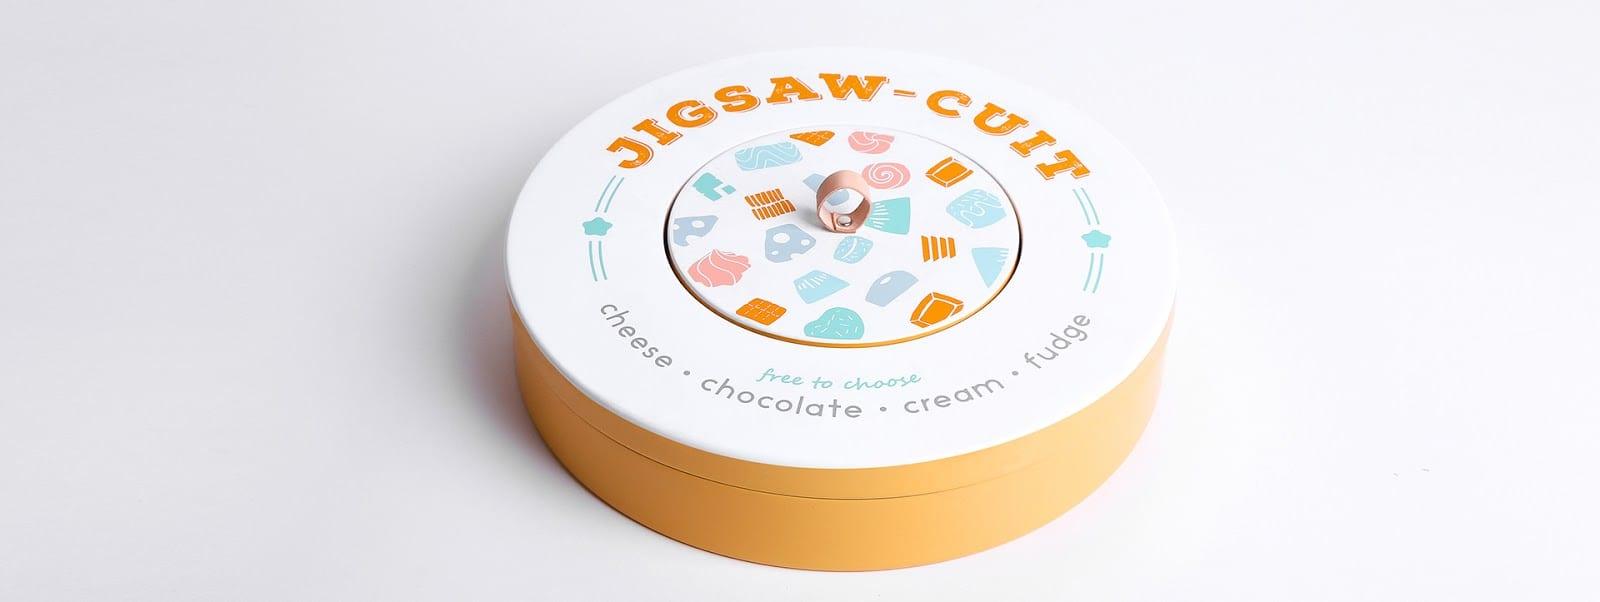 jigsaw cuit 01a - Ach, tie obaly – Jigsaw Cuit